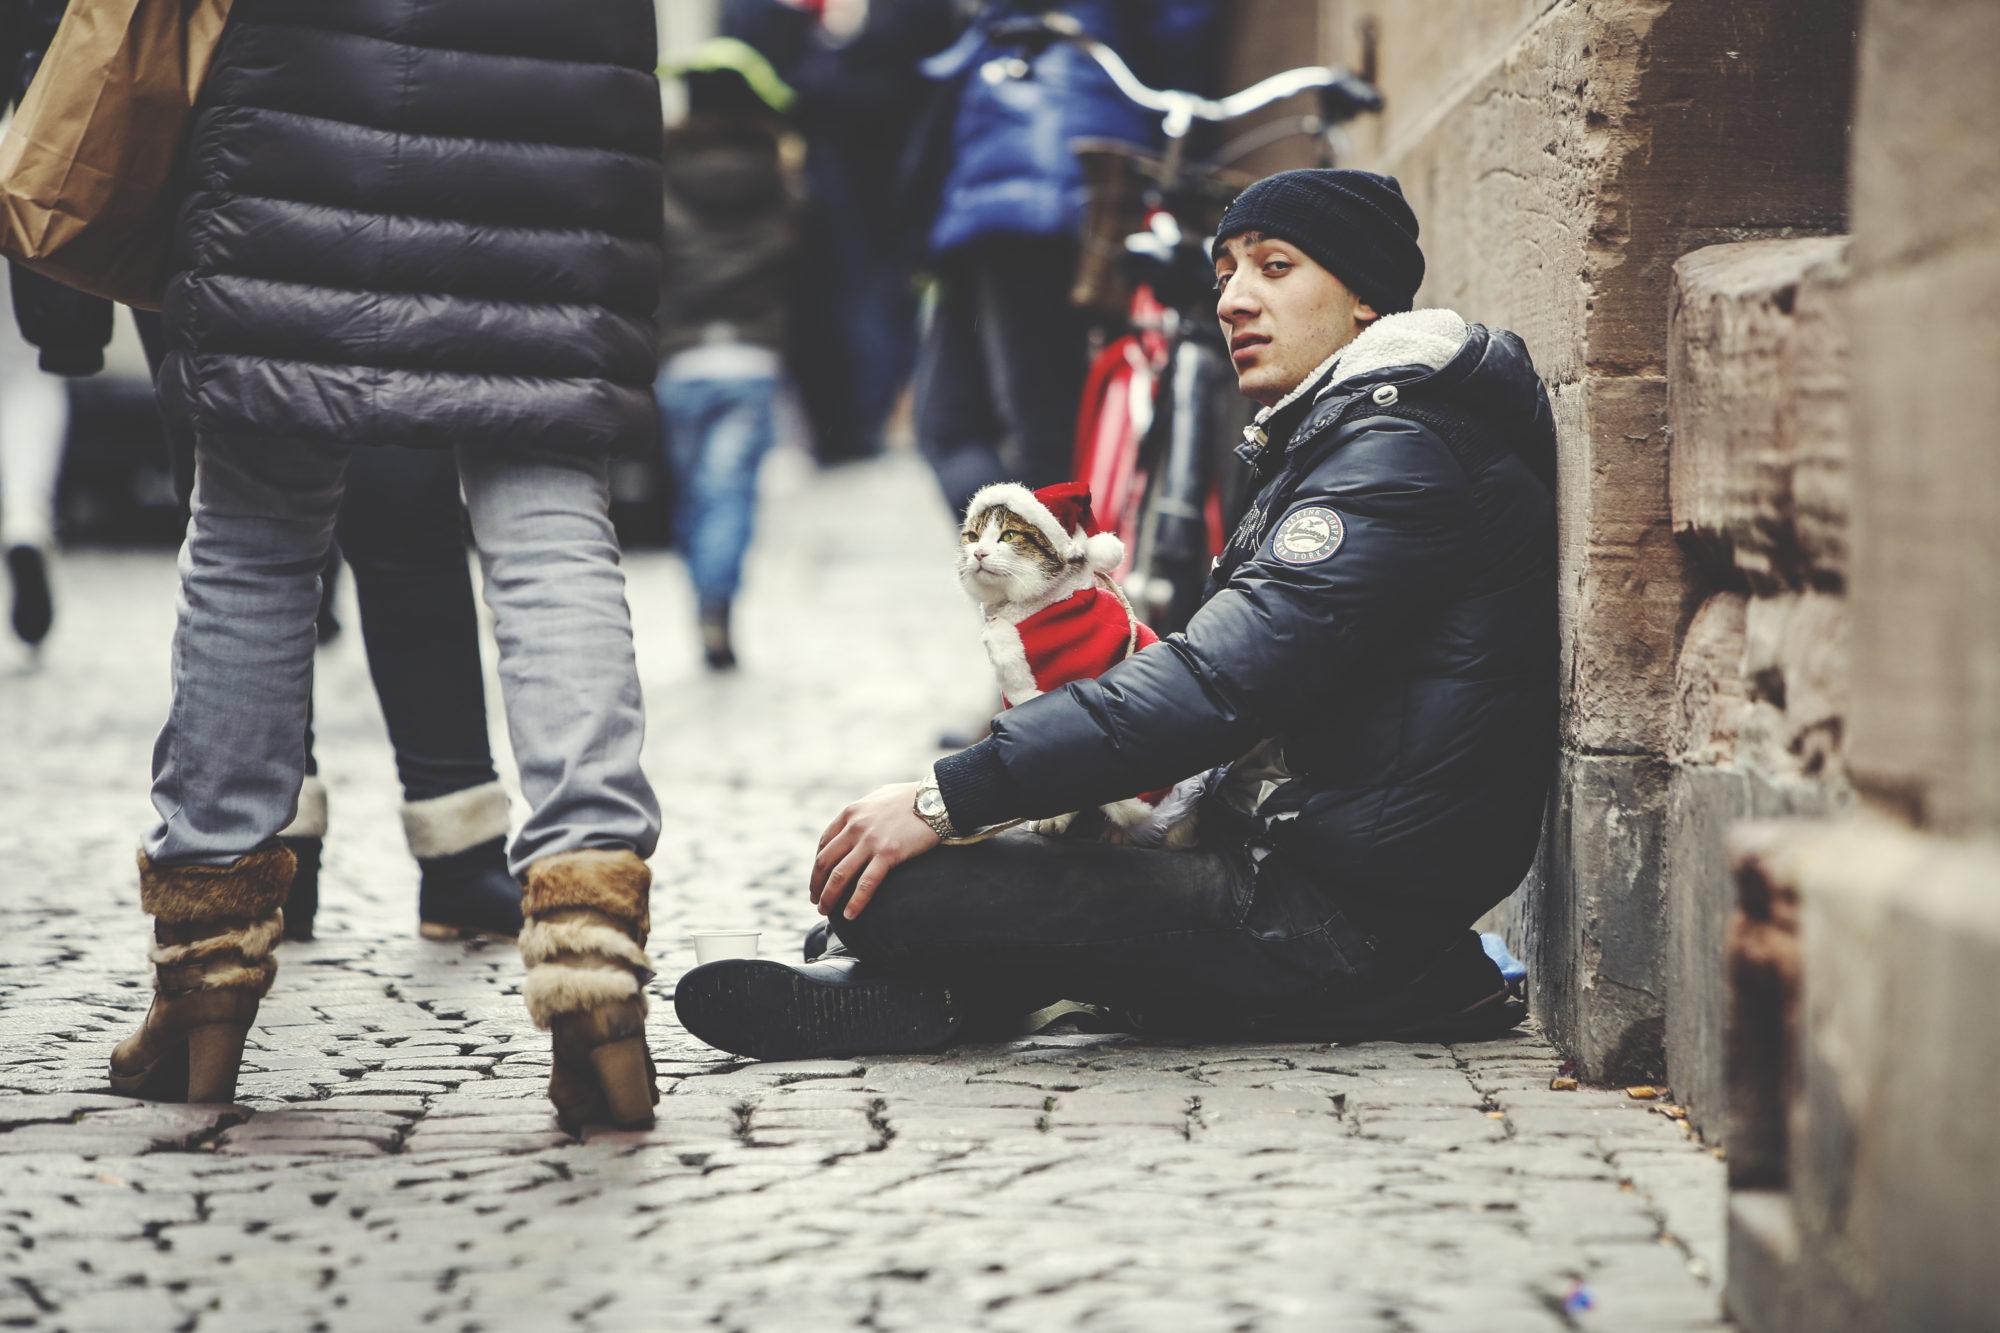 kasuma-streetphotography-travel-blog-strasbourg-christmas-2015-9